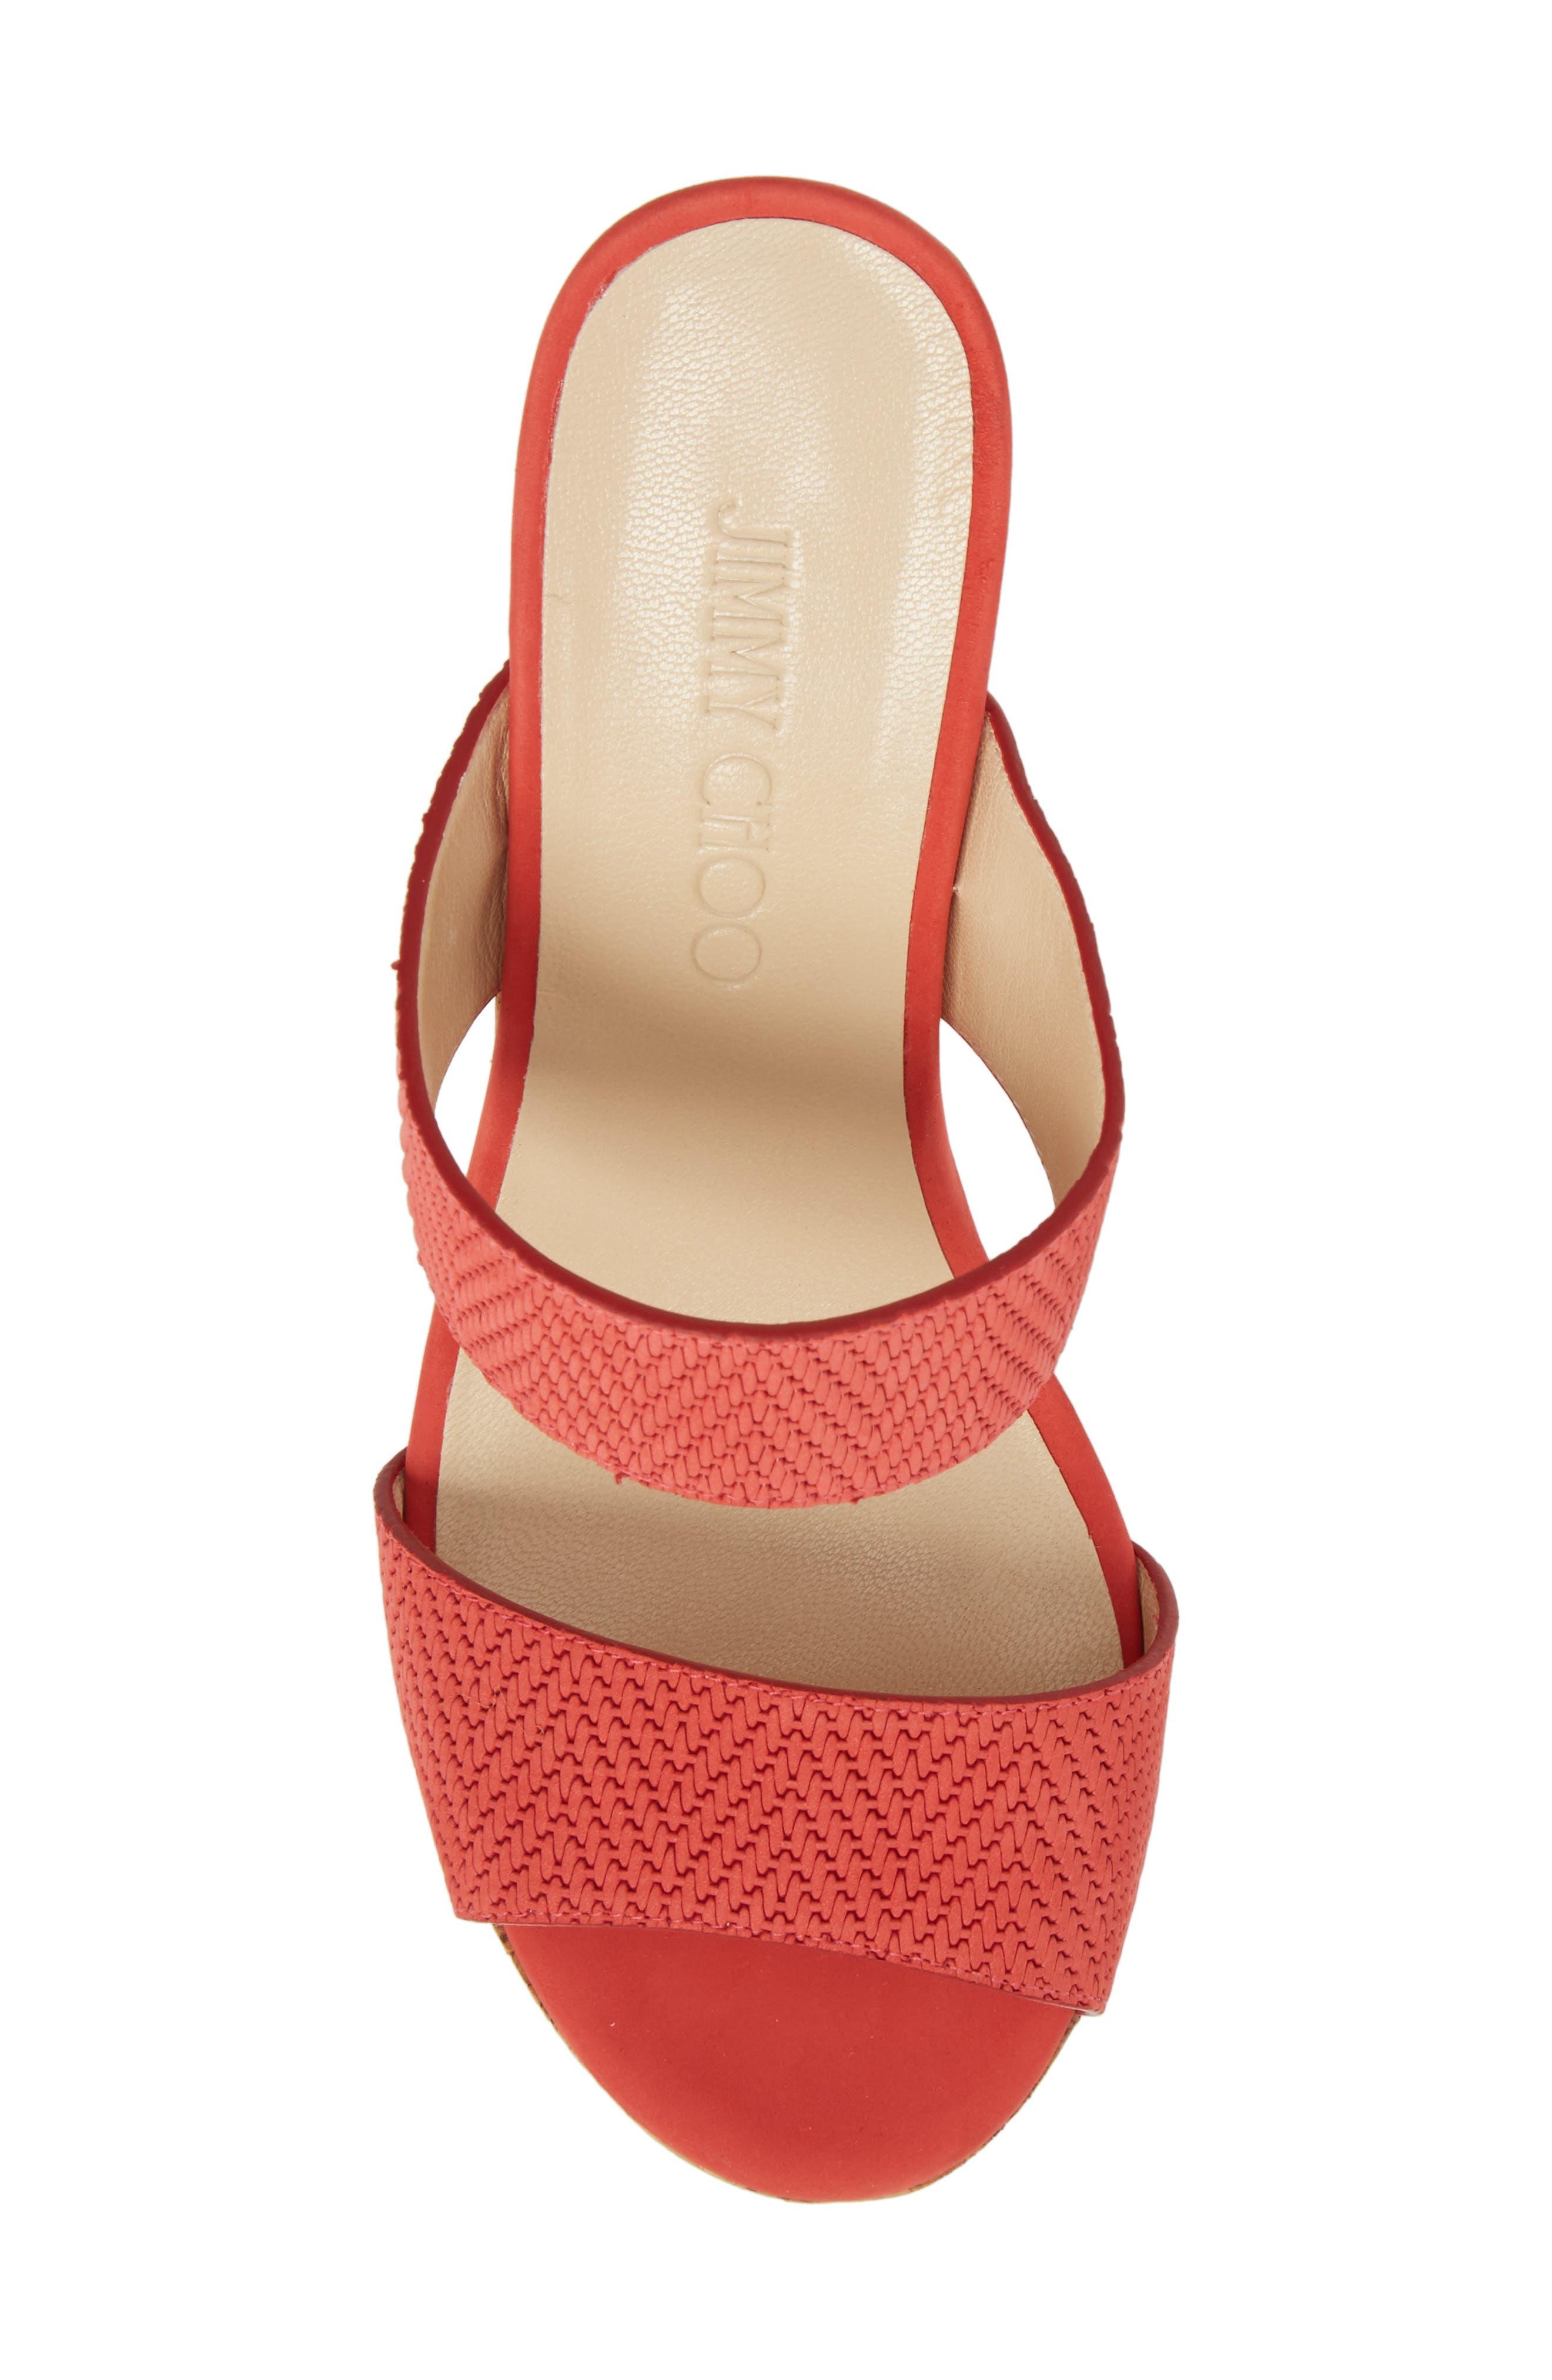 Parker Wedge Slide Sandal,                             Alternate thumbnail 4, color,                             Flamingo Red